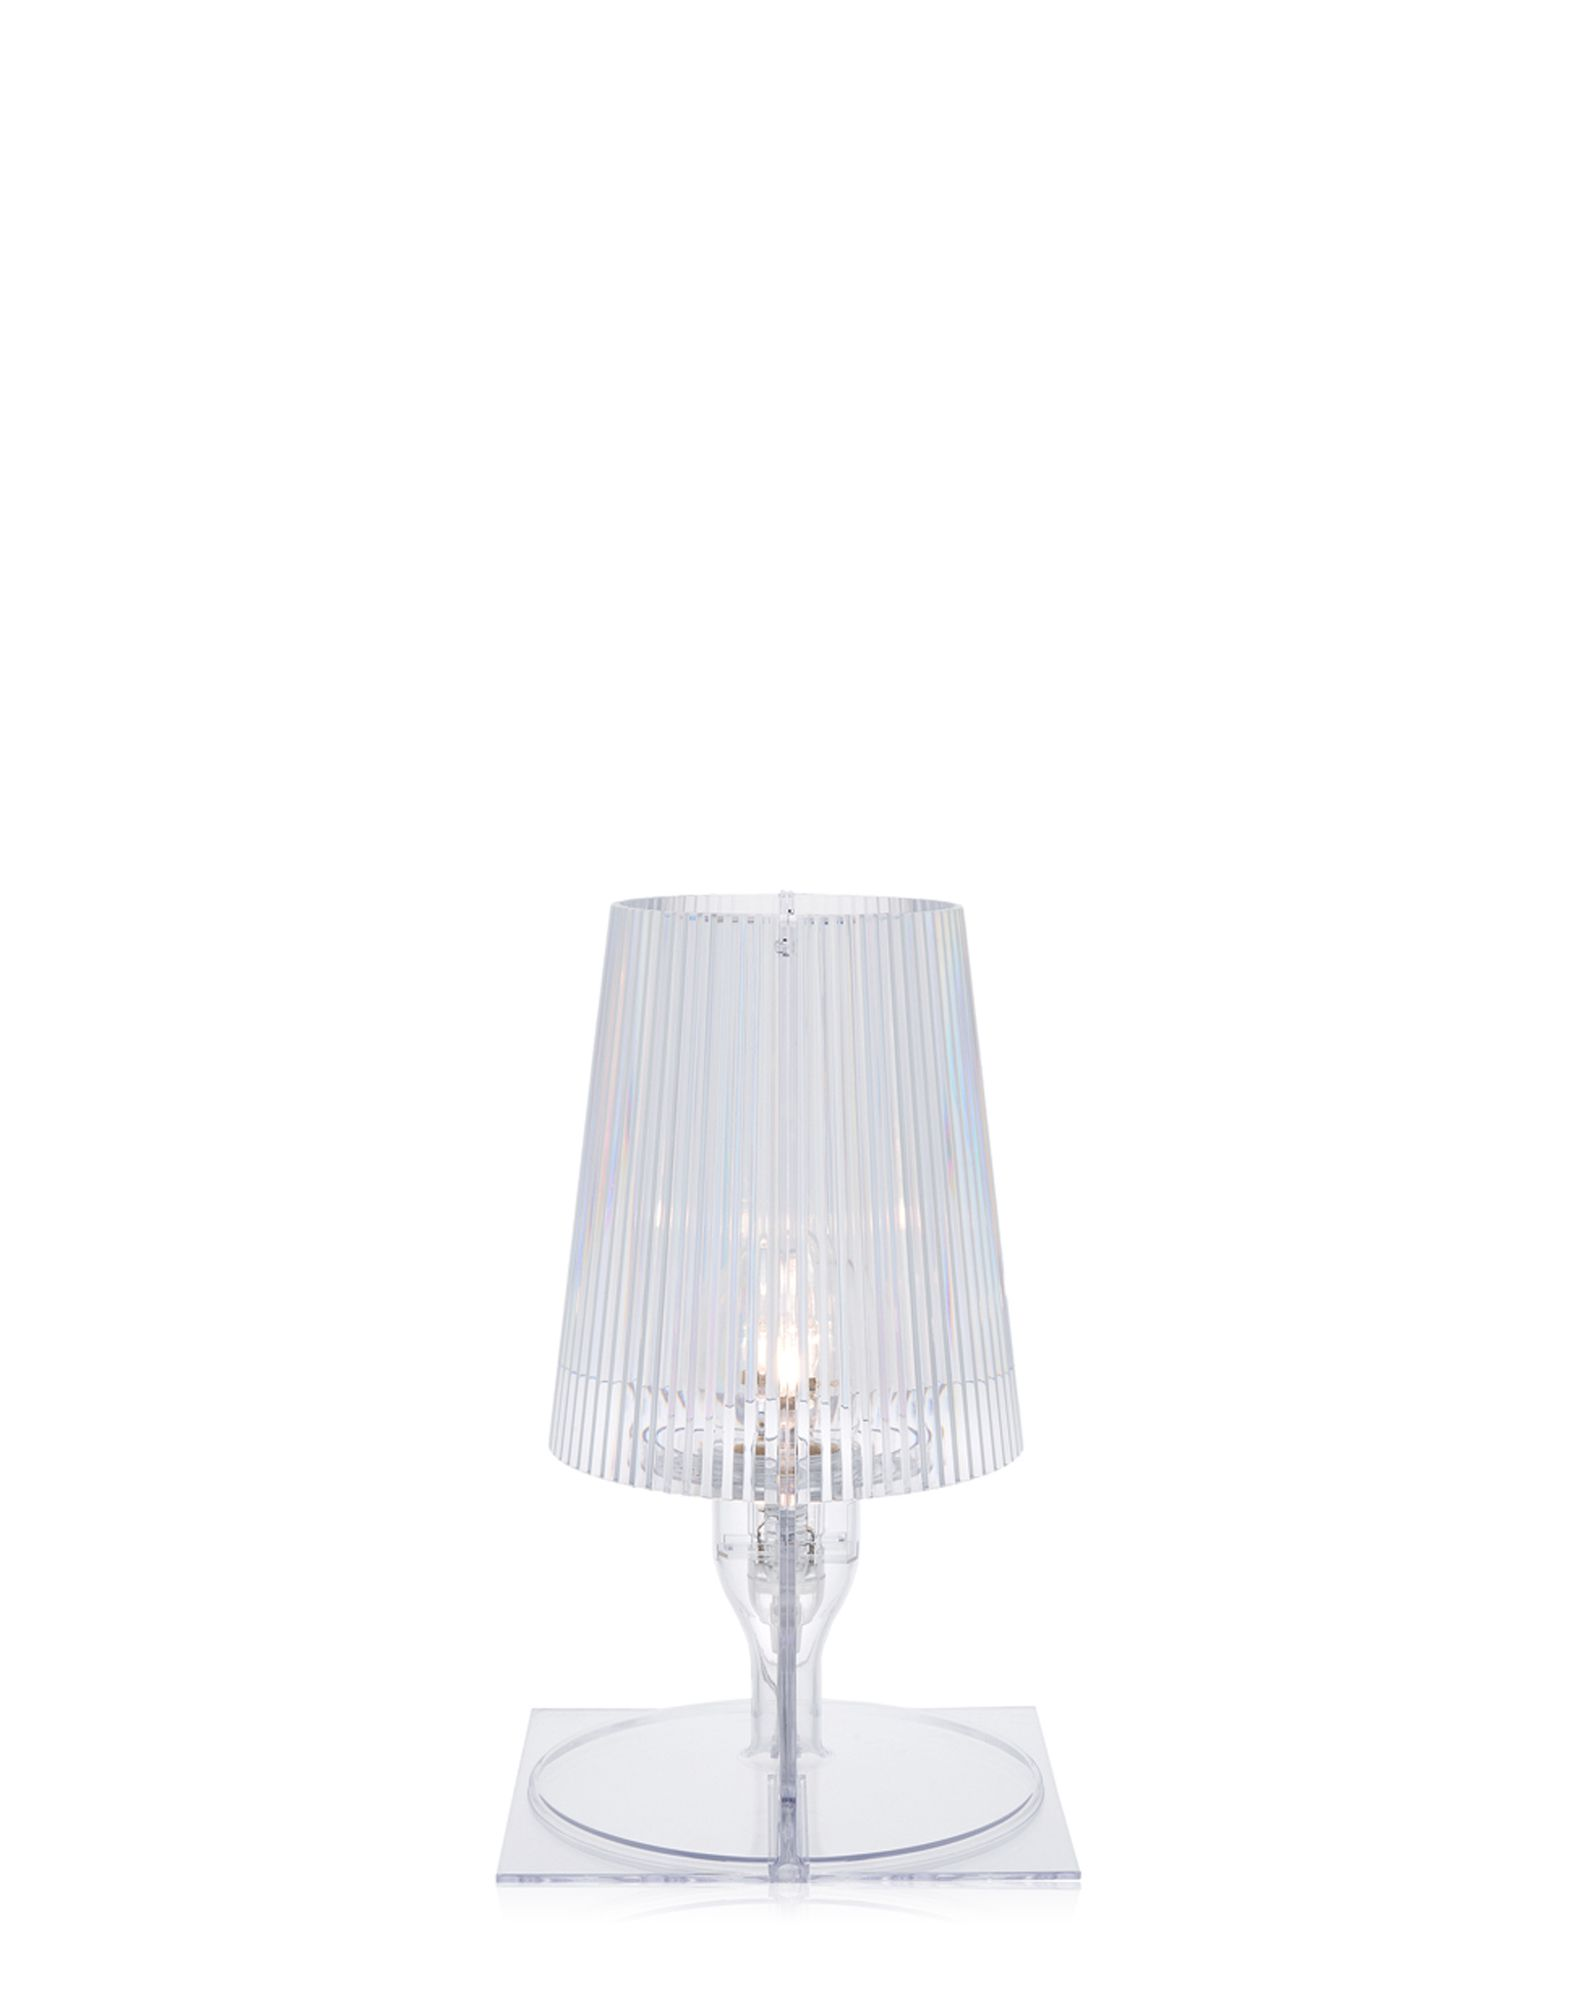 Kartell lampada da tavolo Take cristallo, Newformsdesign | Lampade ...